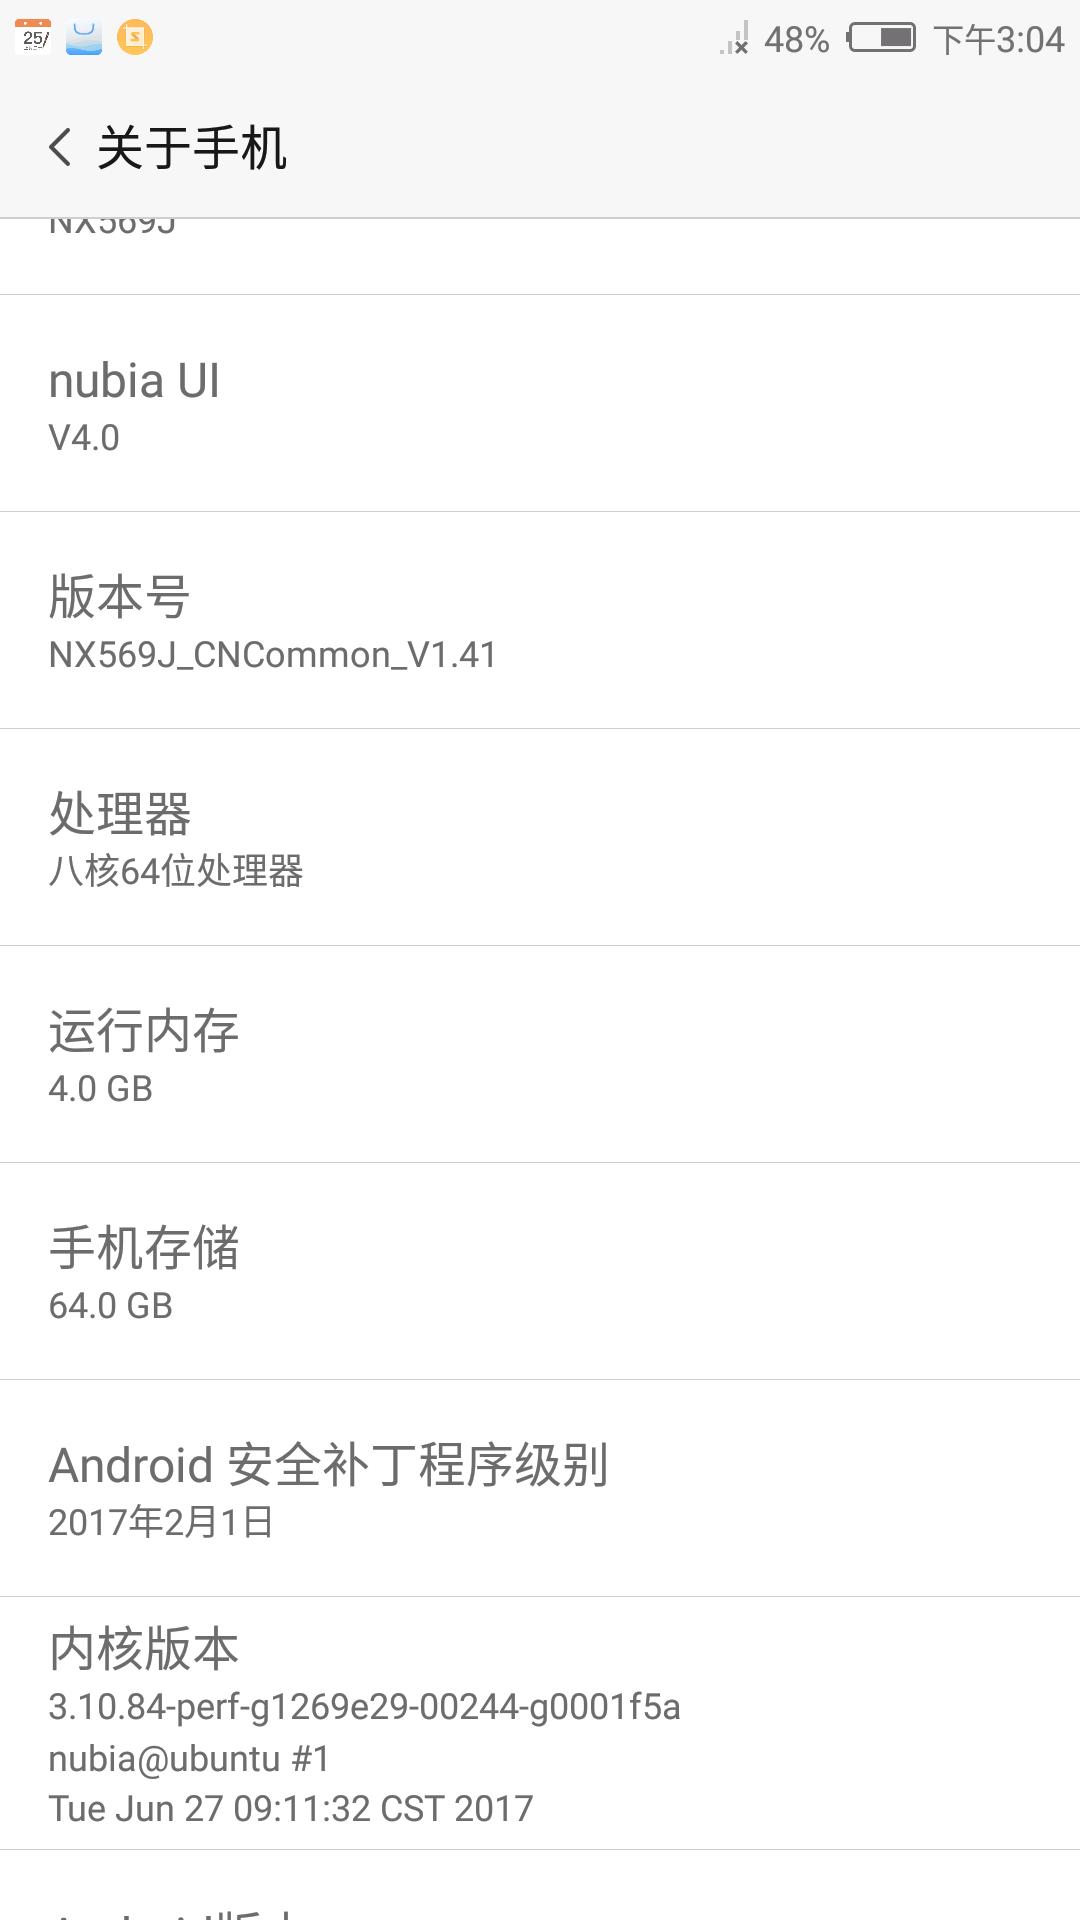 Screenshot_2012-10-31-15-04-11.png